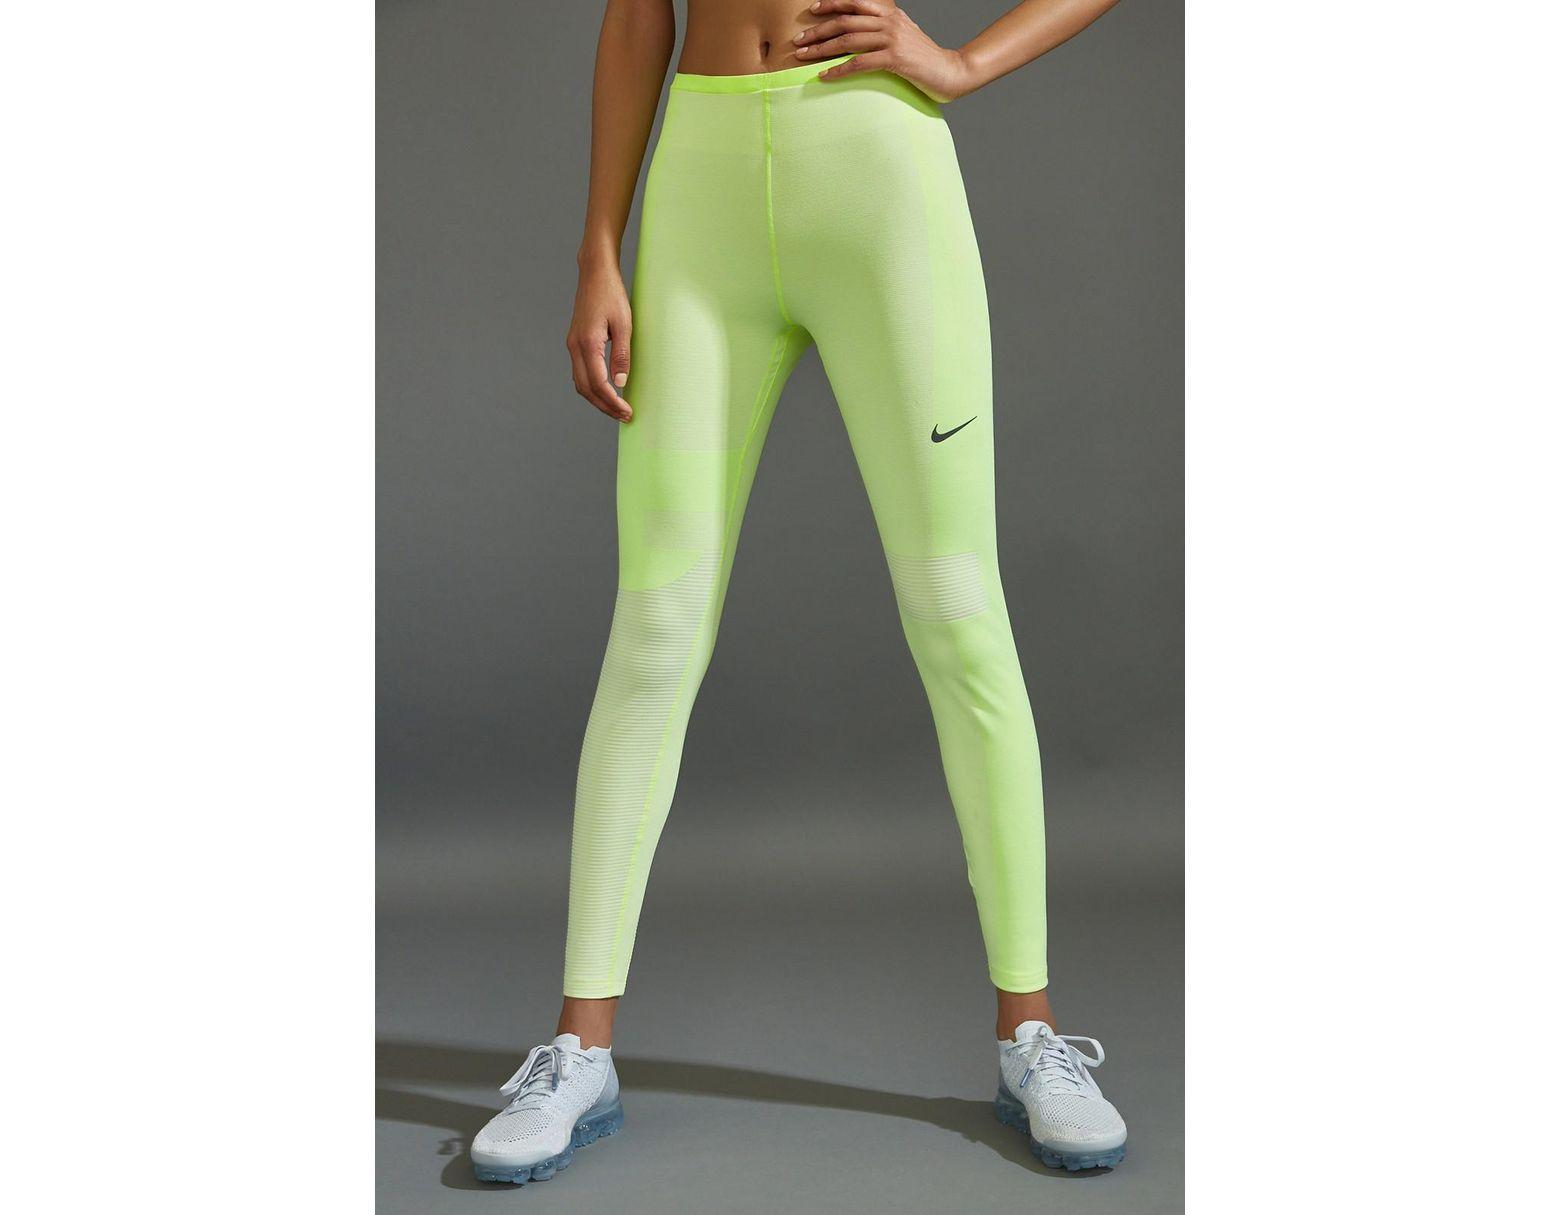 21529a20e10e7 Nike Run Tech Pack Knit Tight in Green - Lyst